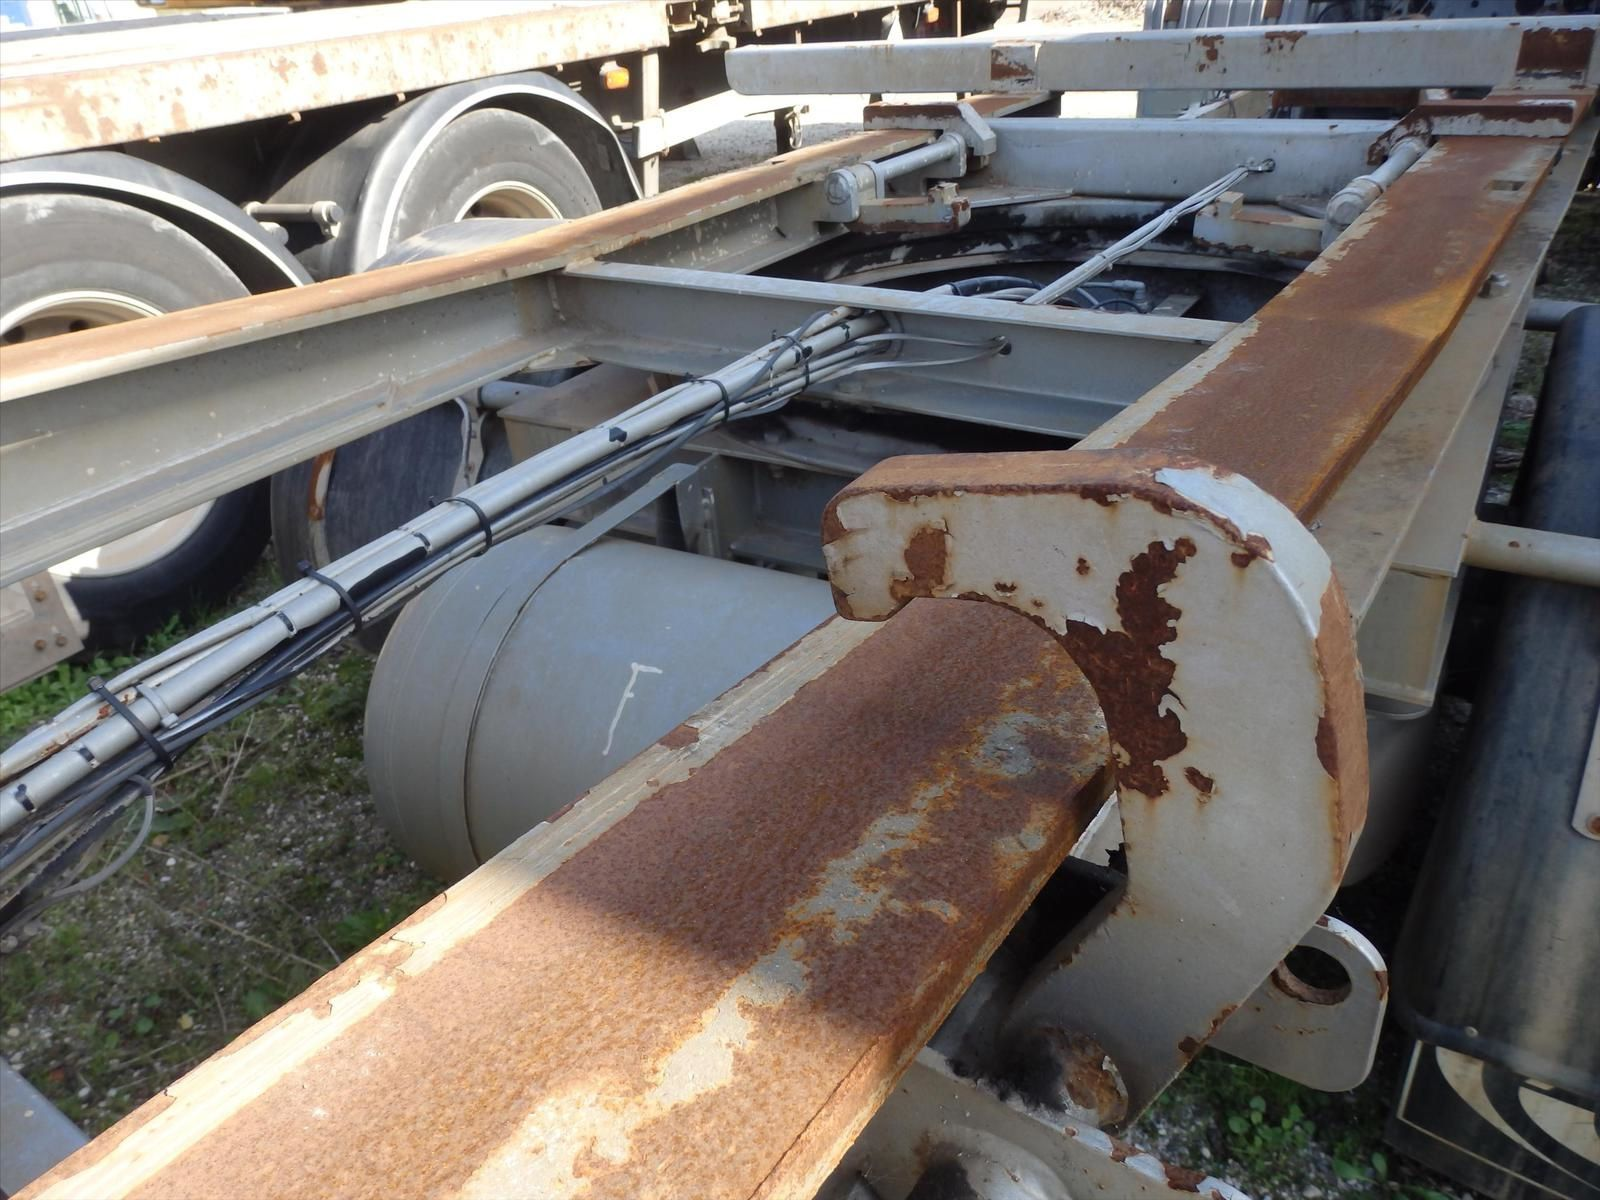 Remorque porte caisson Ampliroll Tel: 0608066192 Transcomm13 Pierre BASSAT